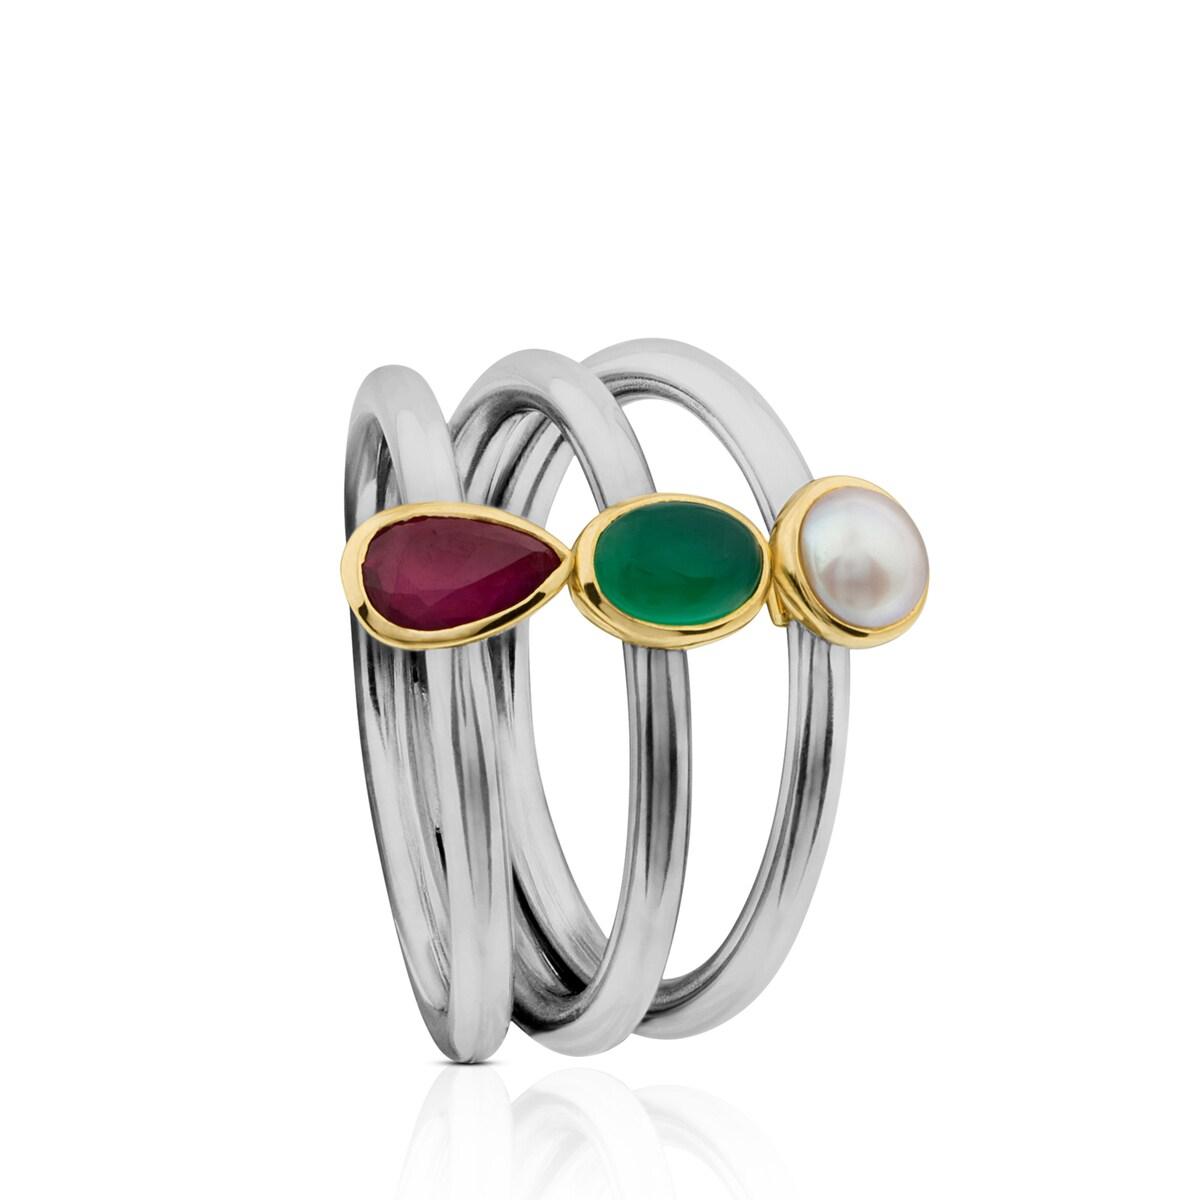 Titanium Gem Power Ring with Gold and Gemstones